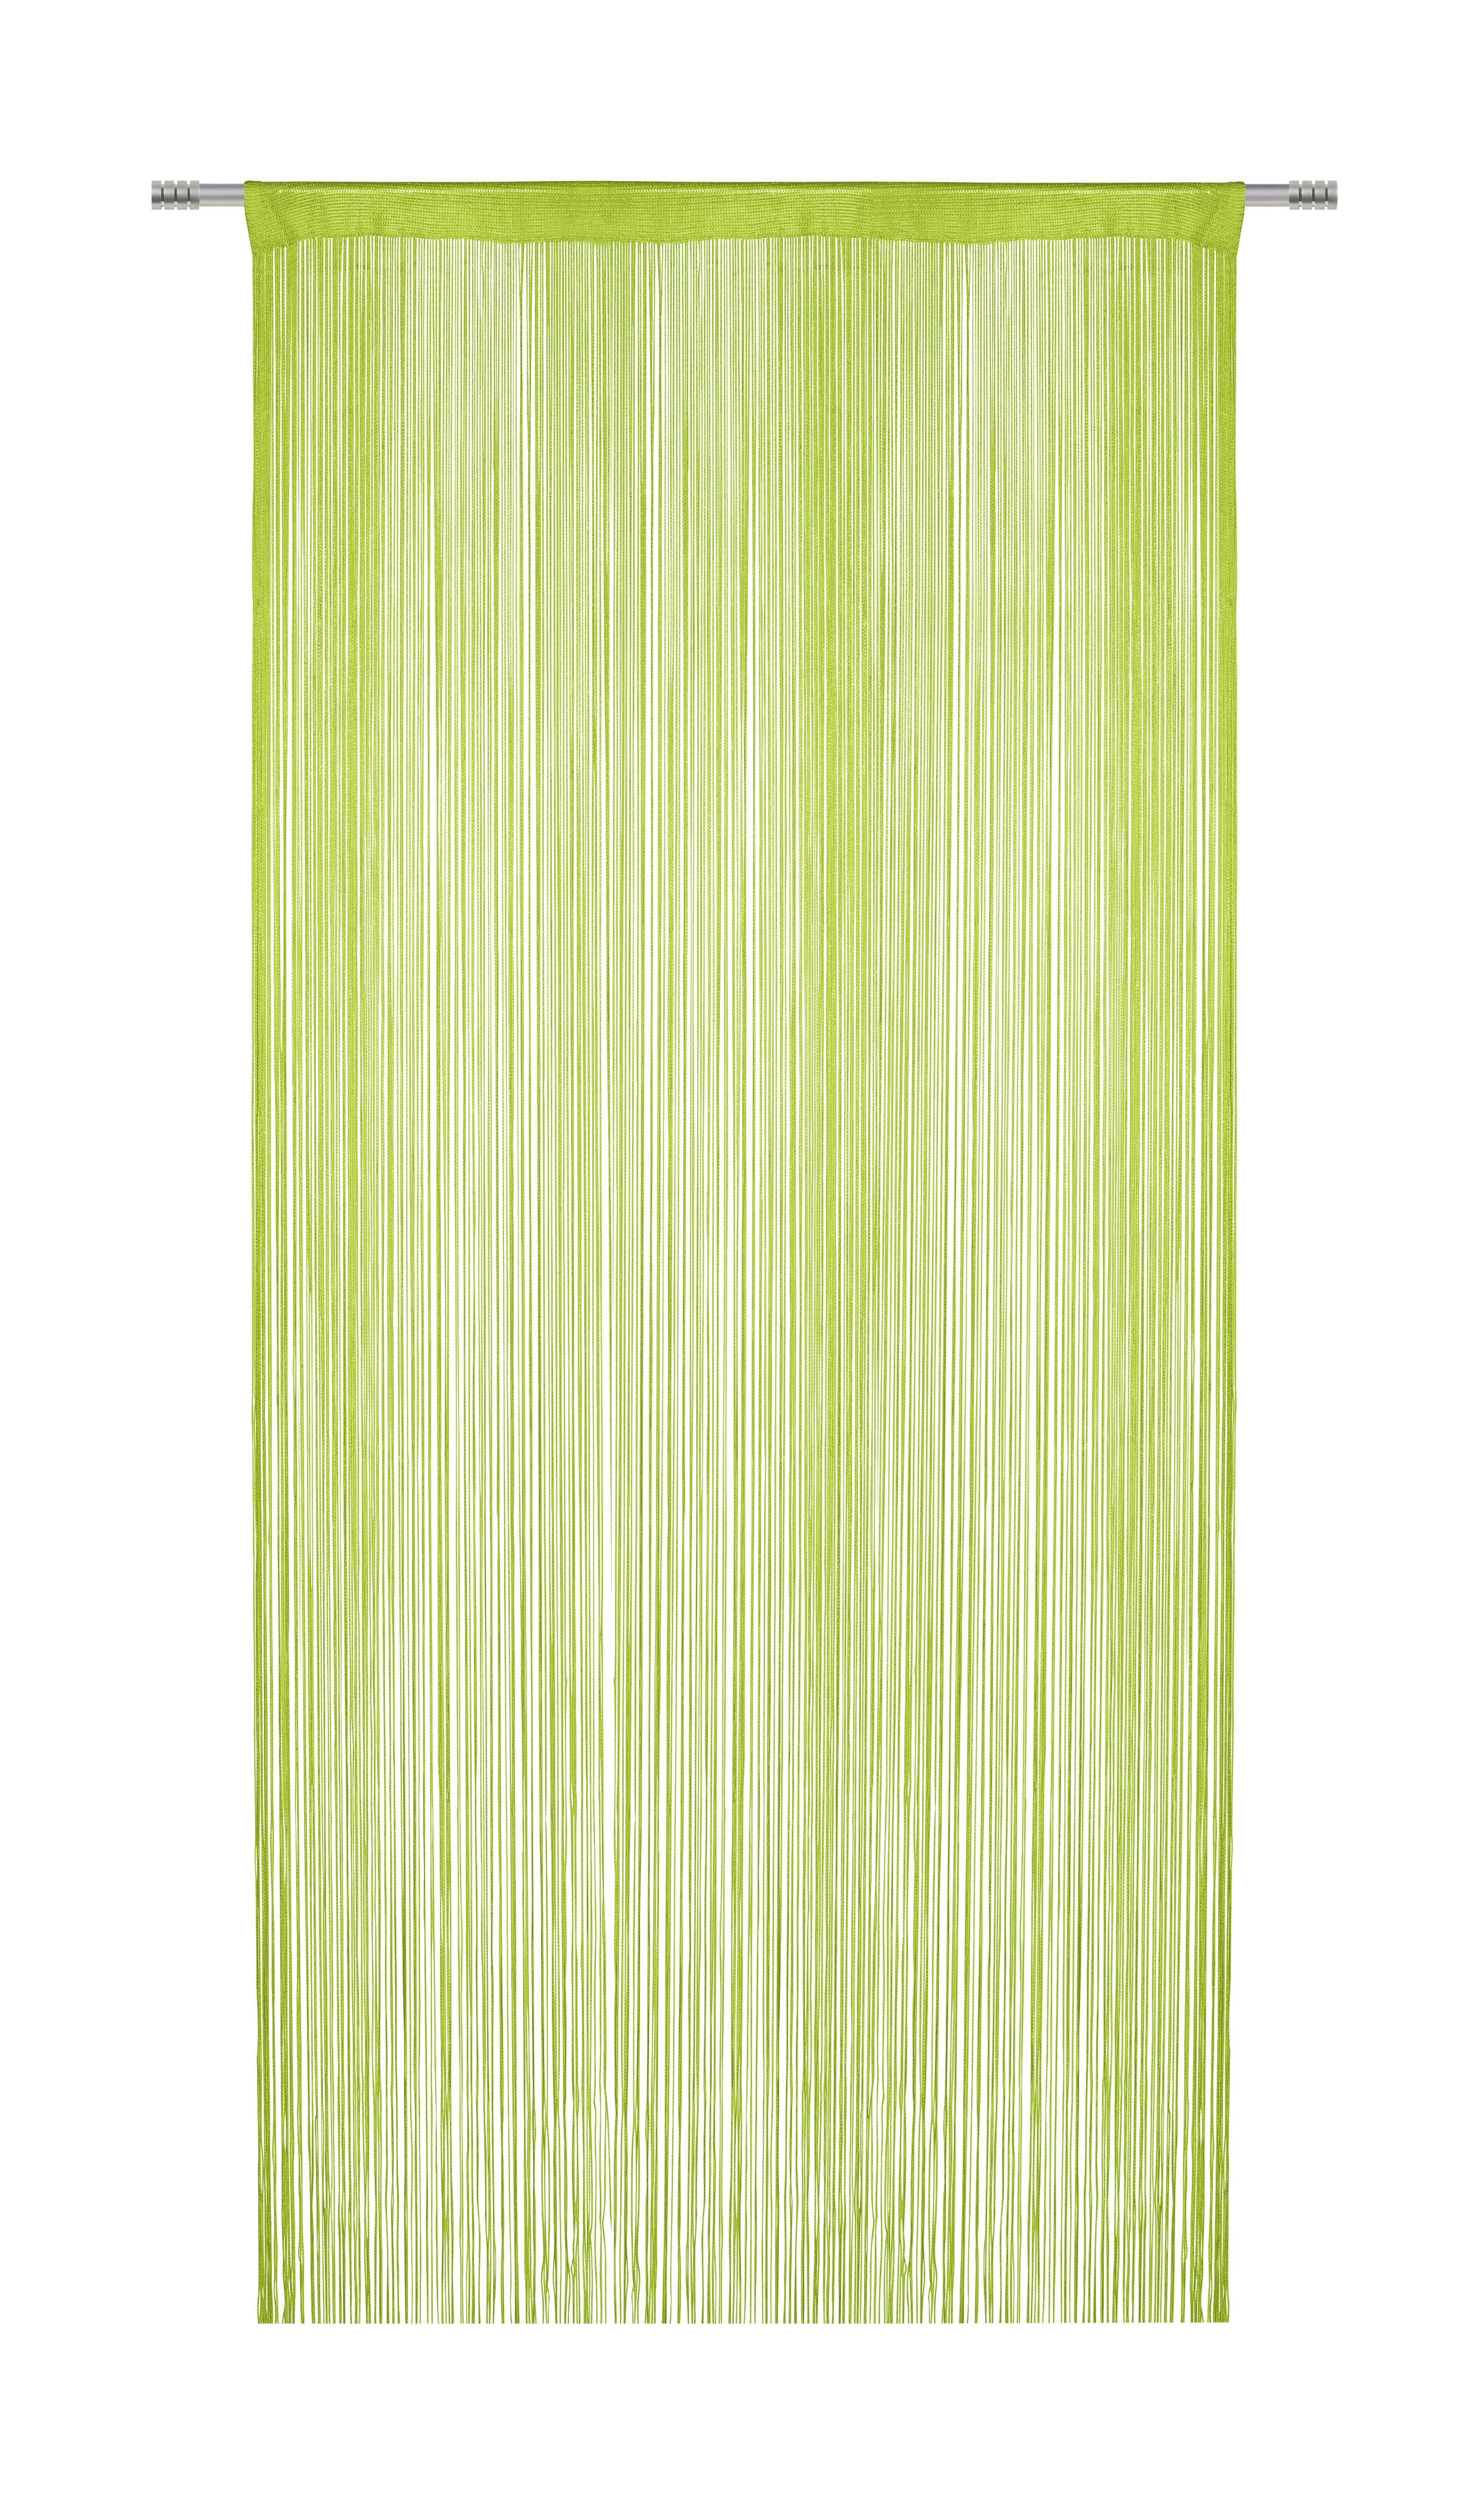 Zsinórfüggöny Franz - zöld, textil (90/245cm) - MÖMAX modern living